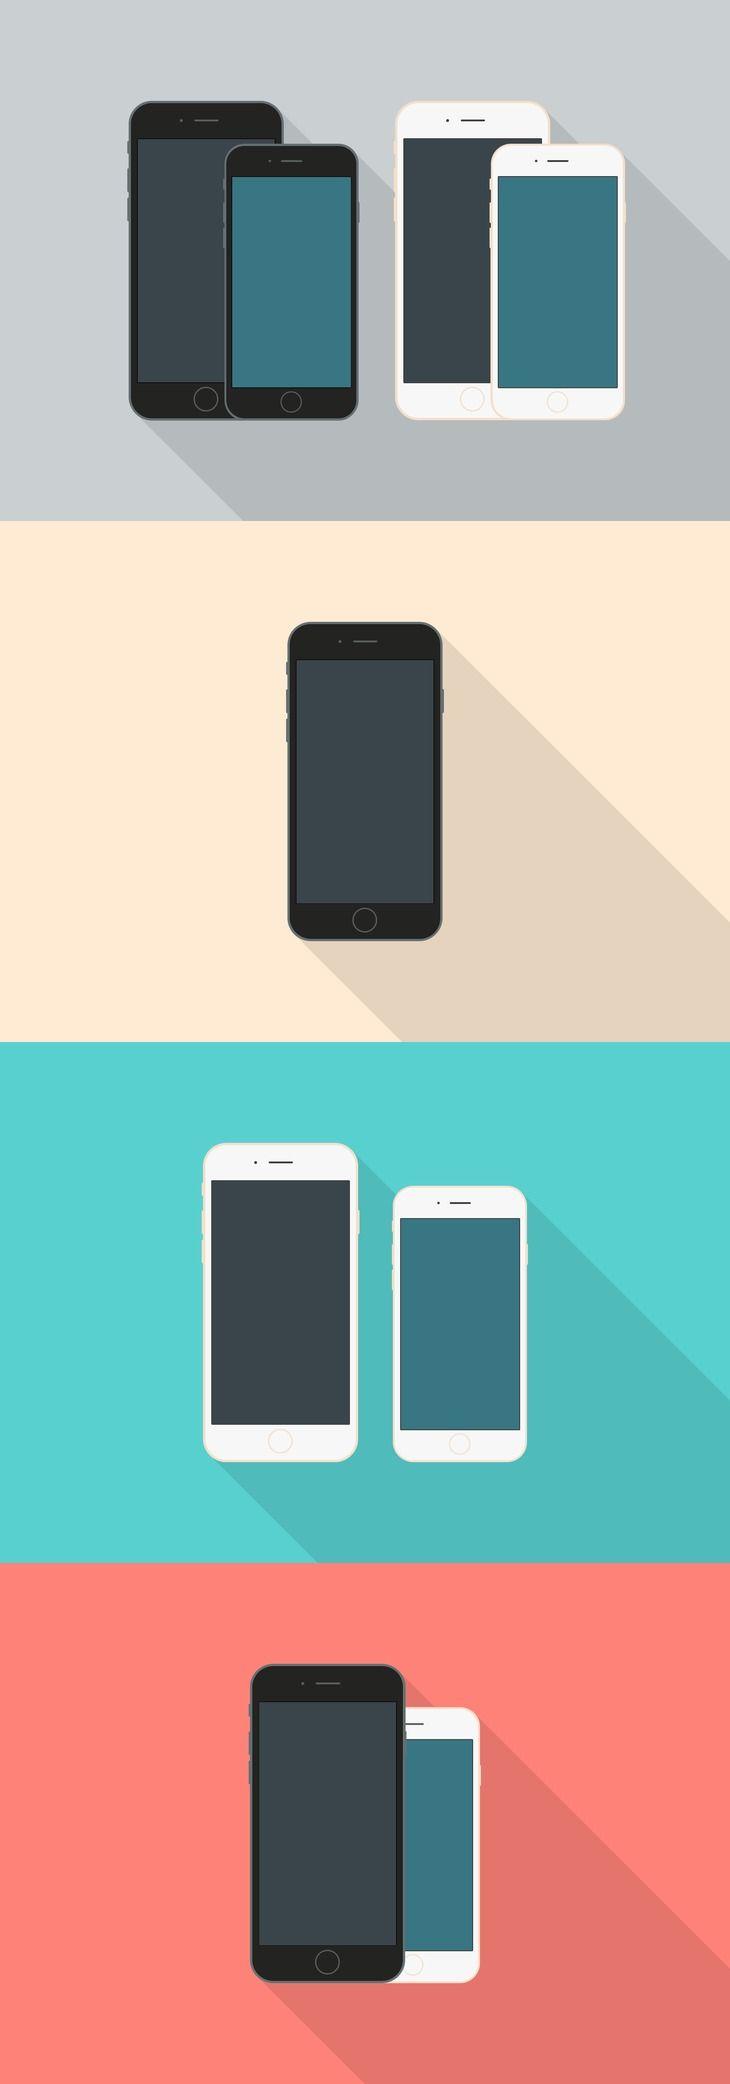 Flat Style iPhone 6 Mockups